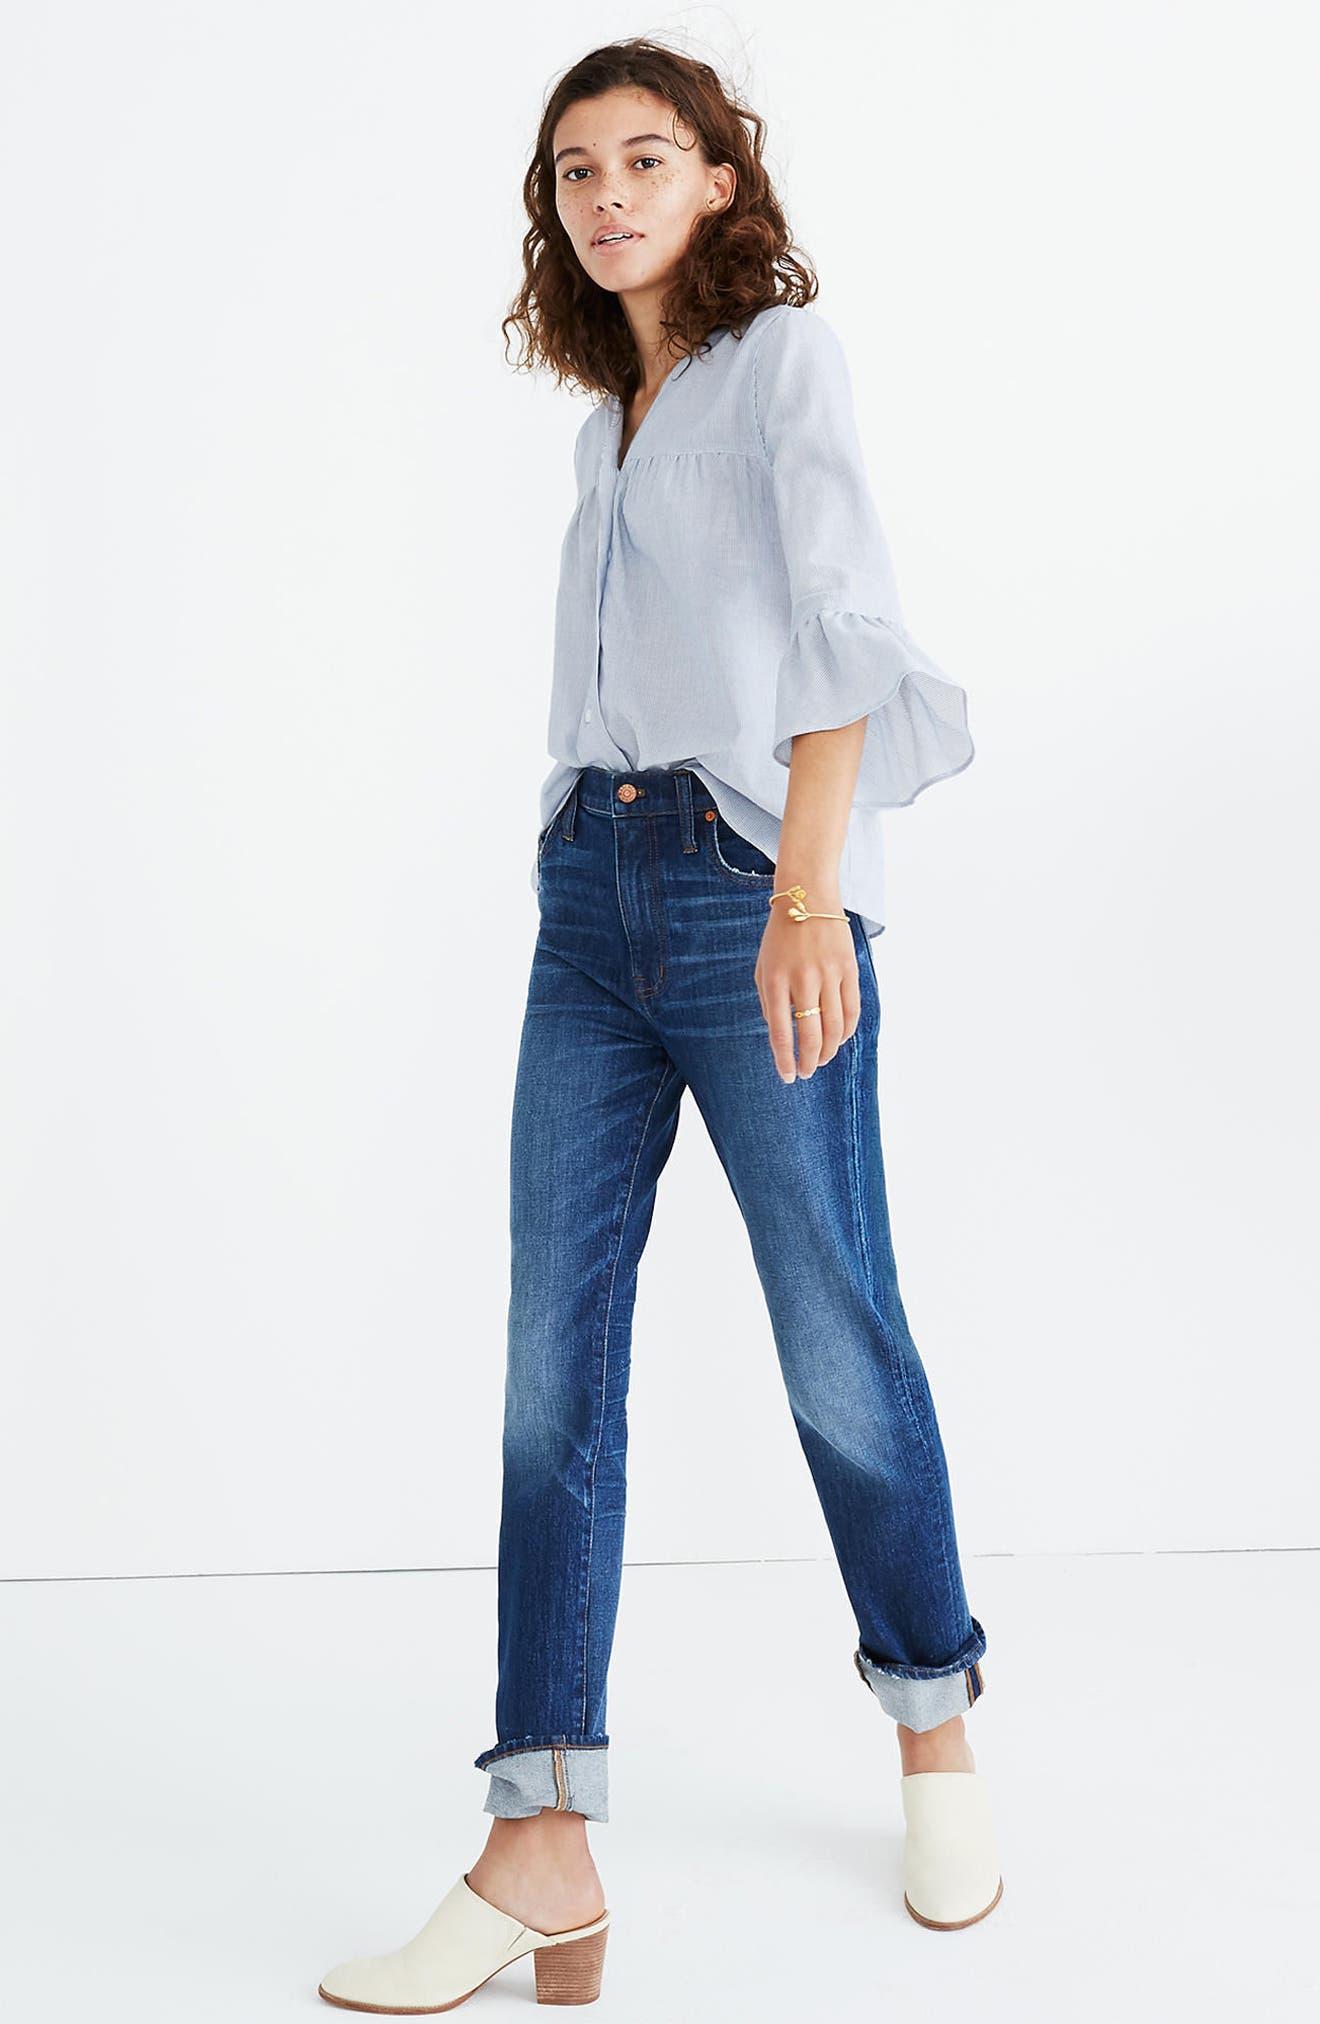 Veranda Bell Sleeve Shirt,                             Alternate thumbnail 3, color,                             Royal Blue